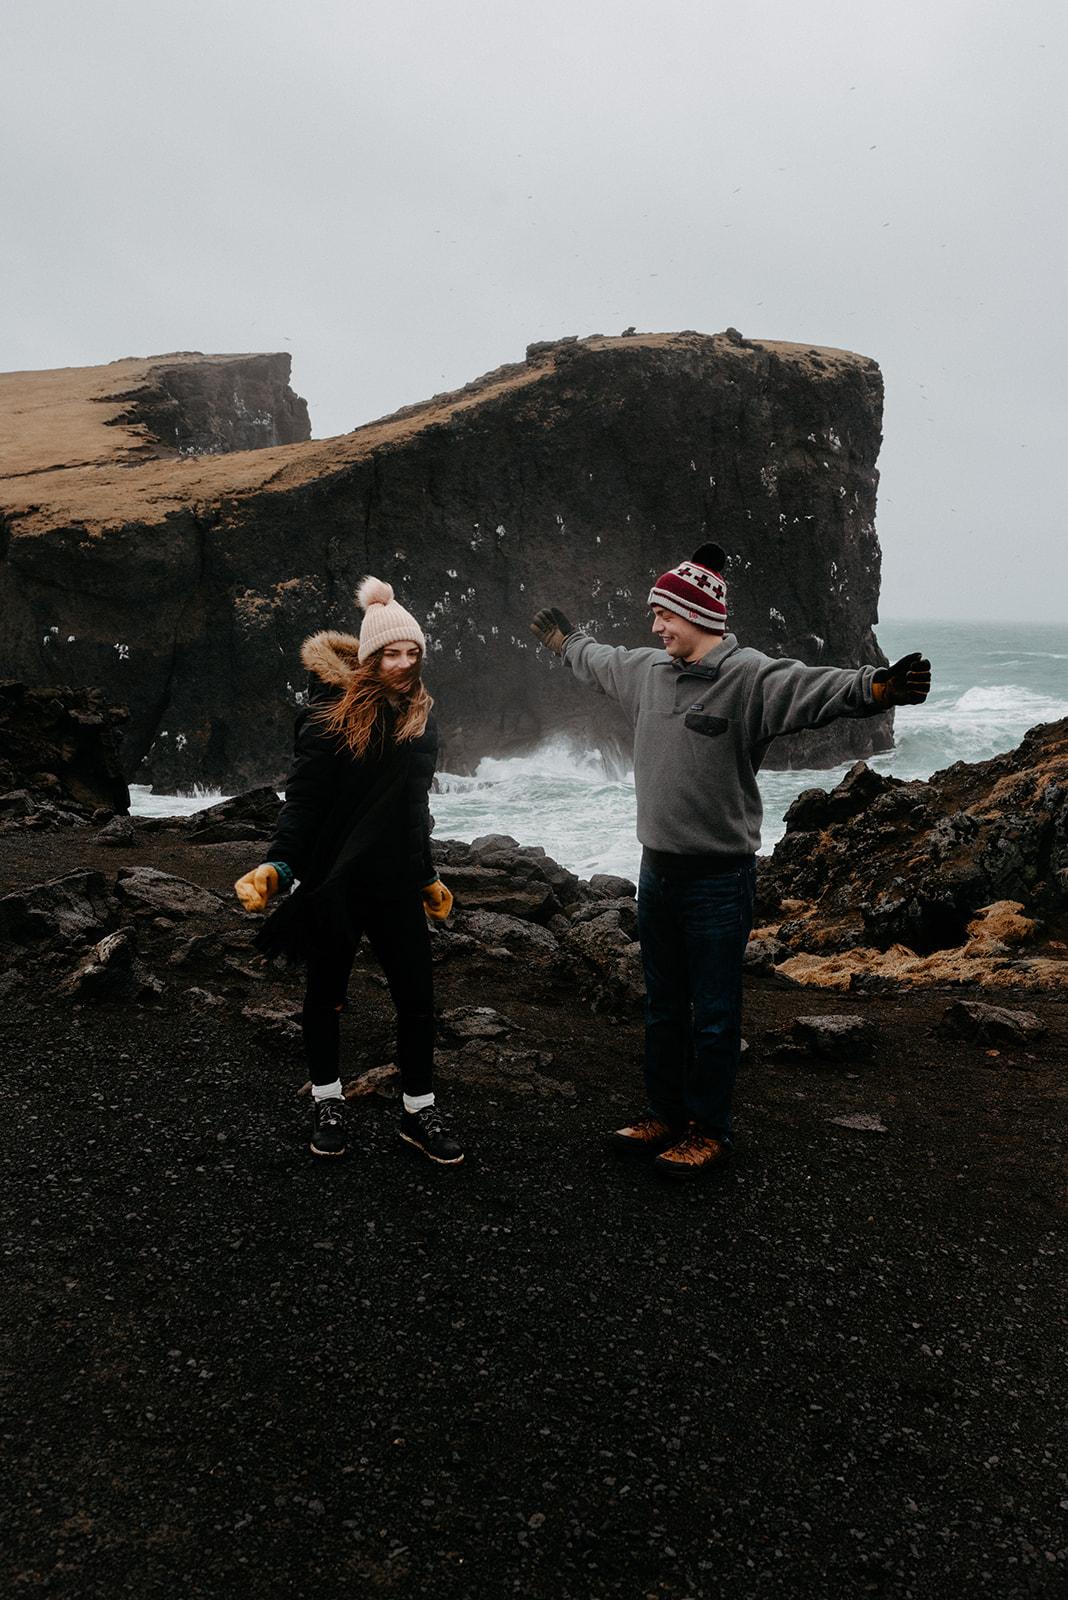 Mack & Michael - Sesja na Islandii 19 alebosco islandia mm 19